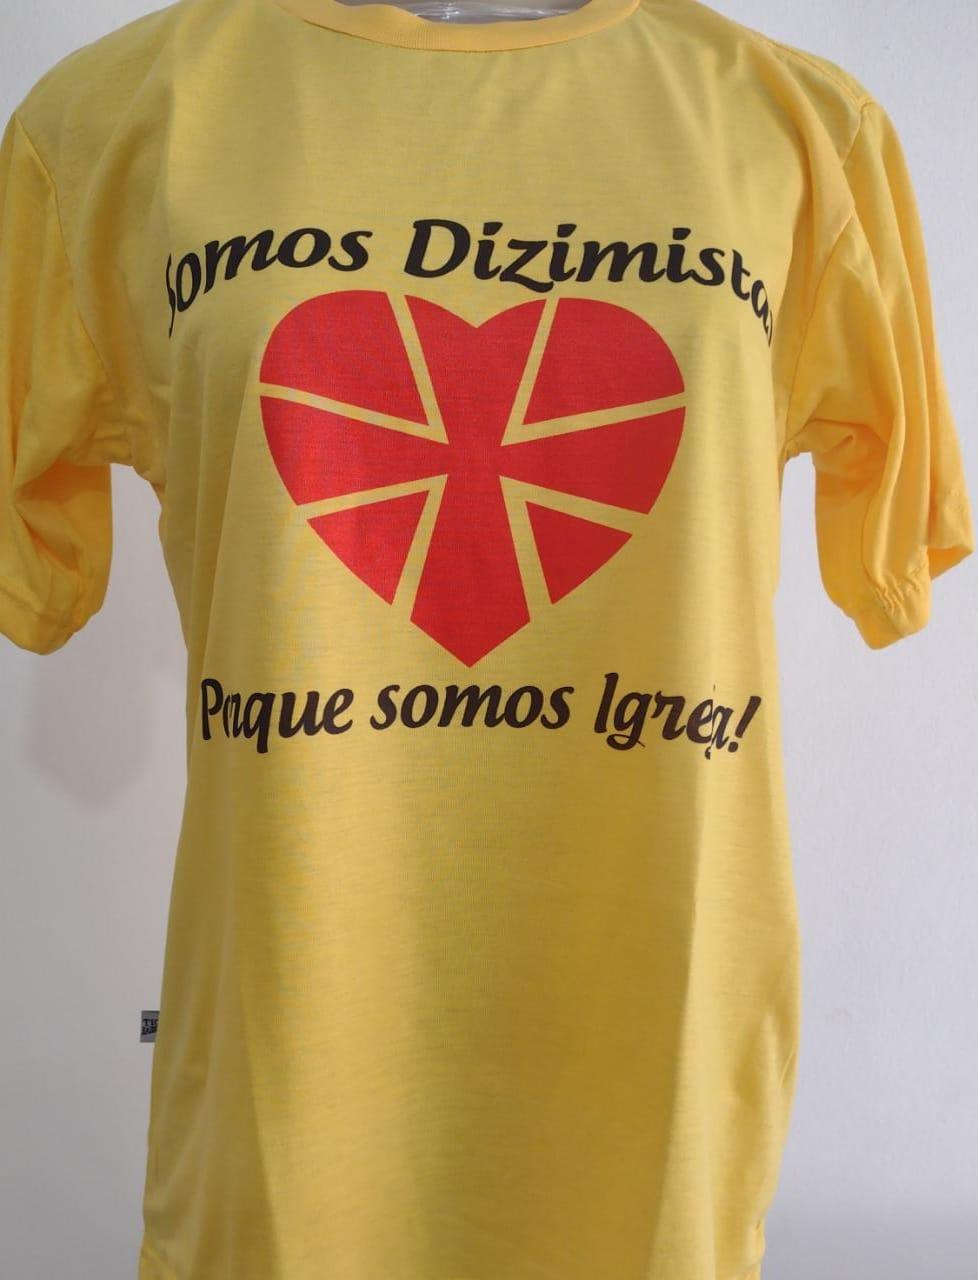 CA33 - Camiseta Poliester Amarela Dizimo F/C  - VindVedShop - Distribuidora Catolica